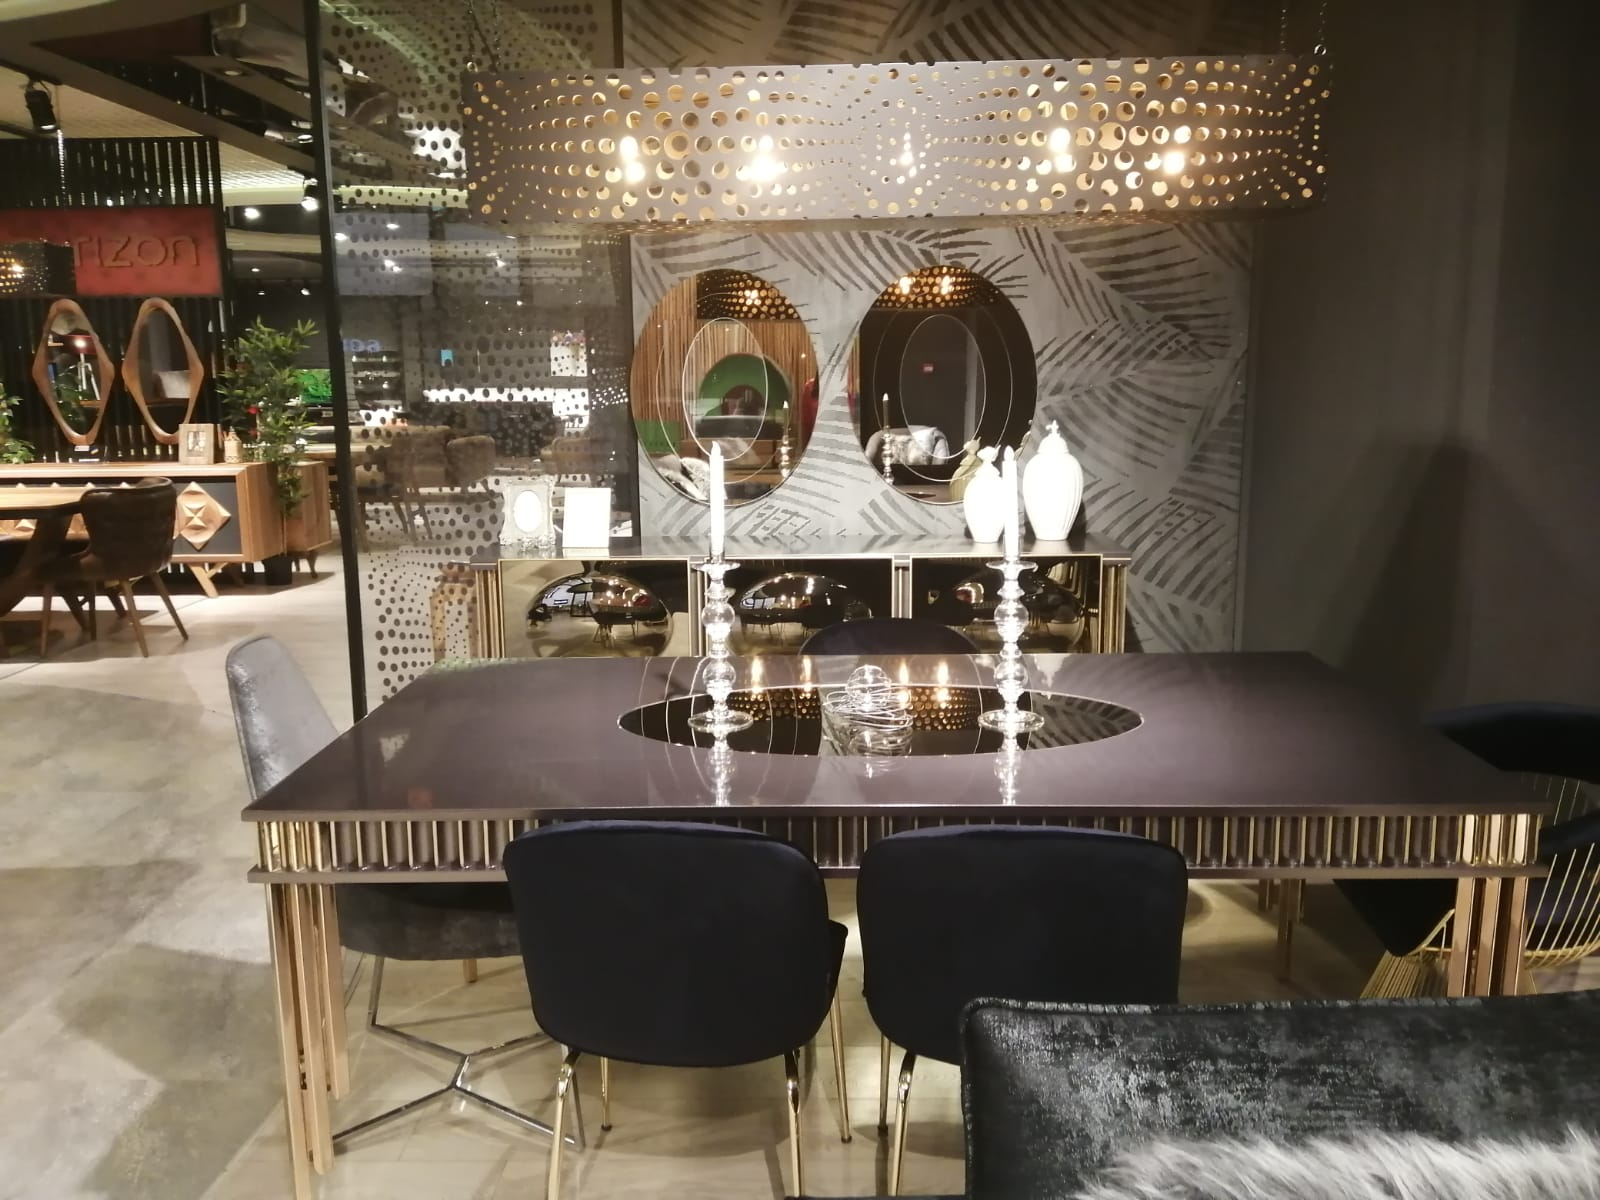 Oreo Dining Room